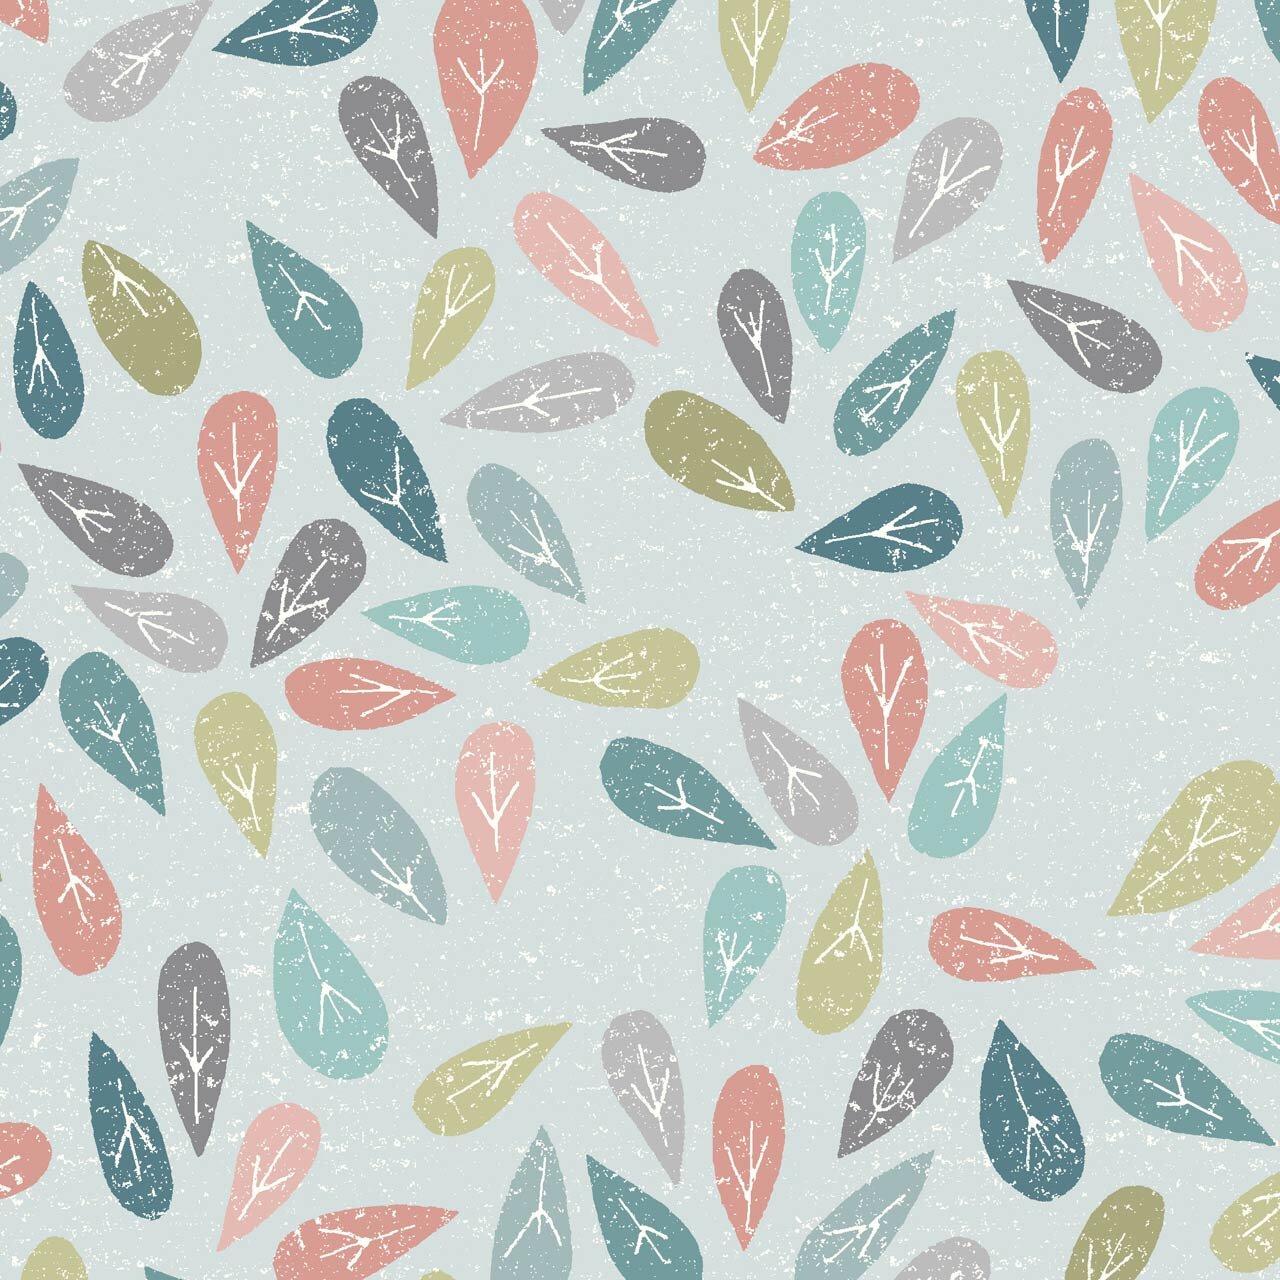 Elements - Leaves